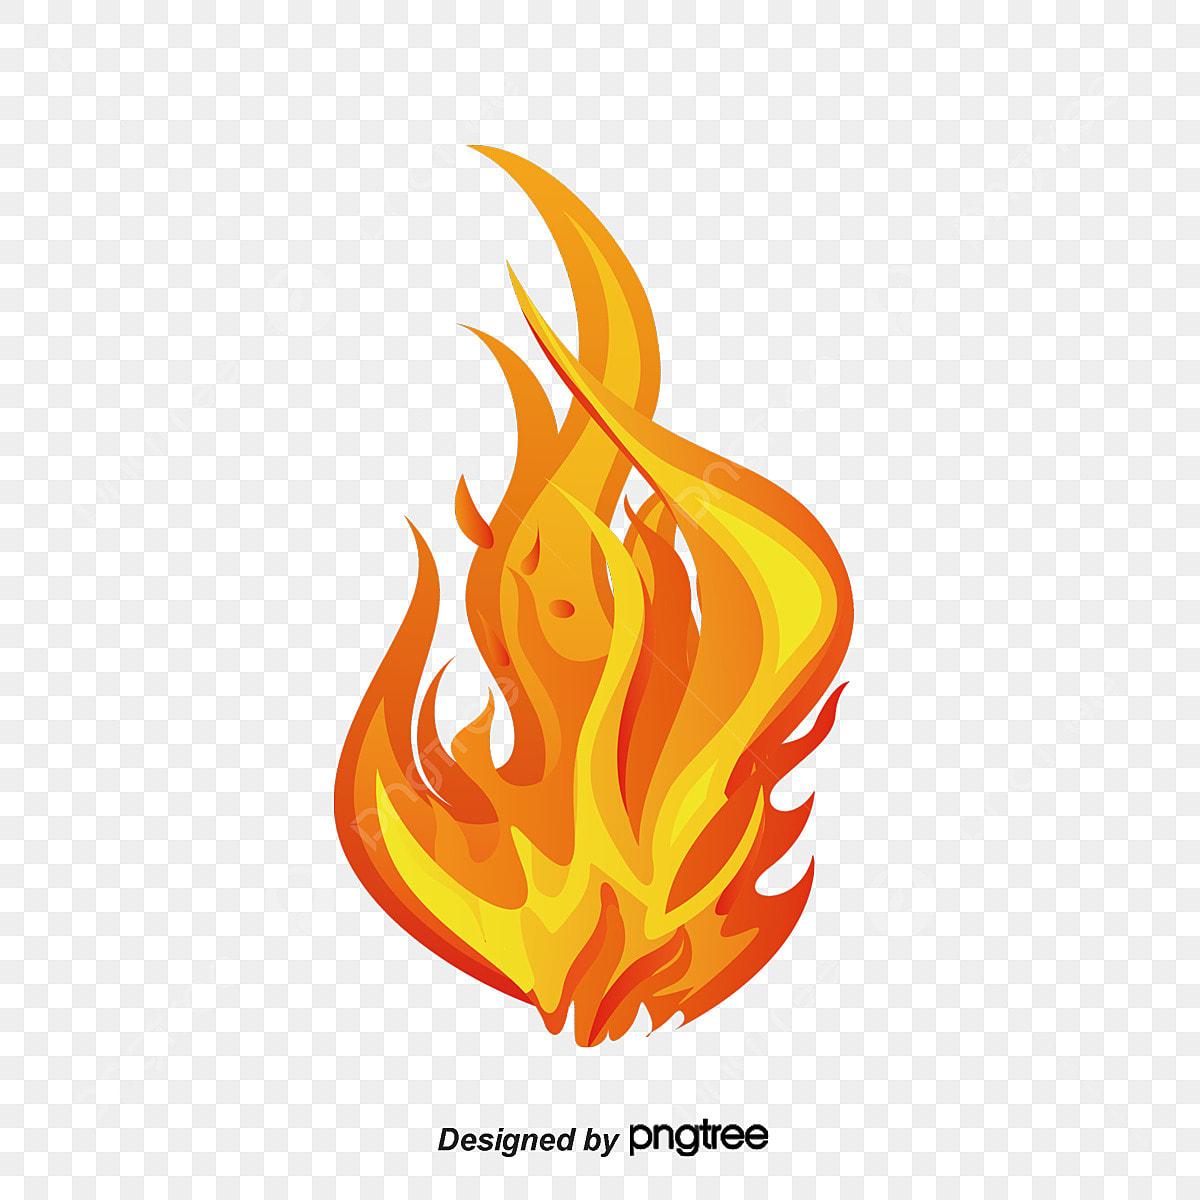 Les Flammes De Dessins Animes Flamme Dessin Centro De Feu